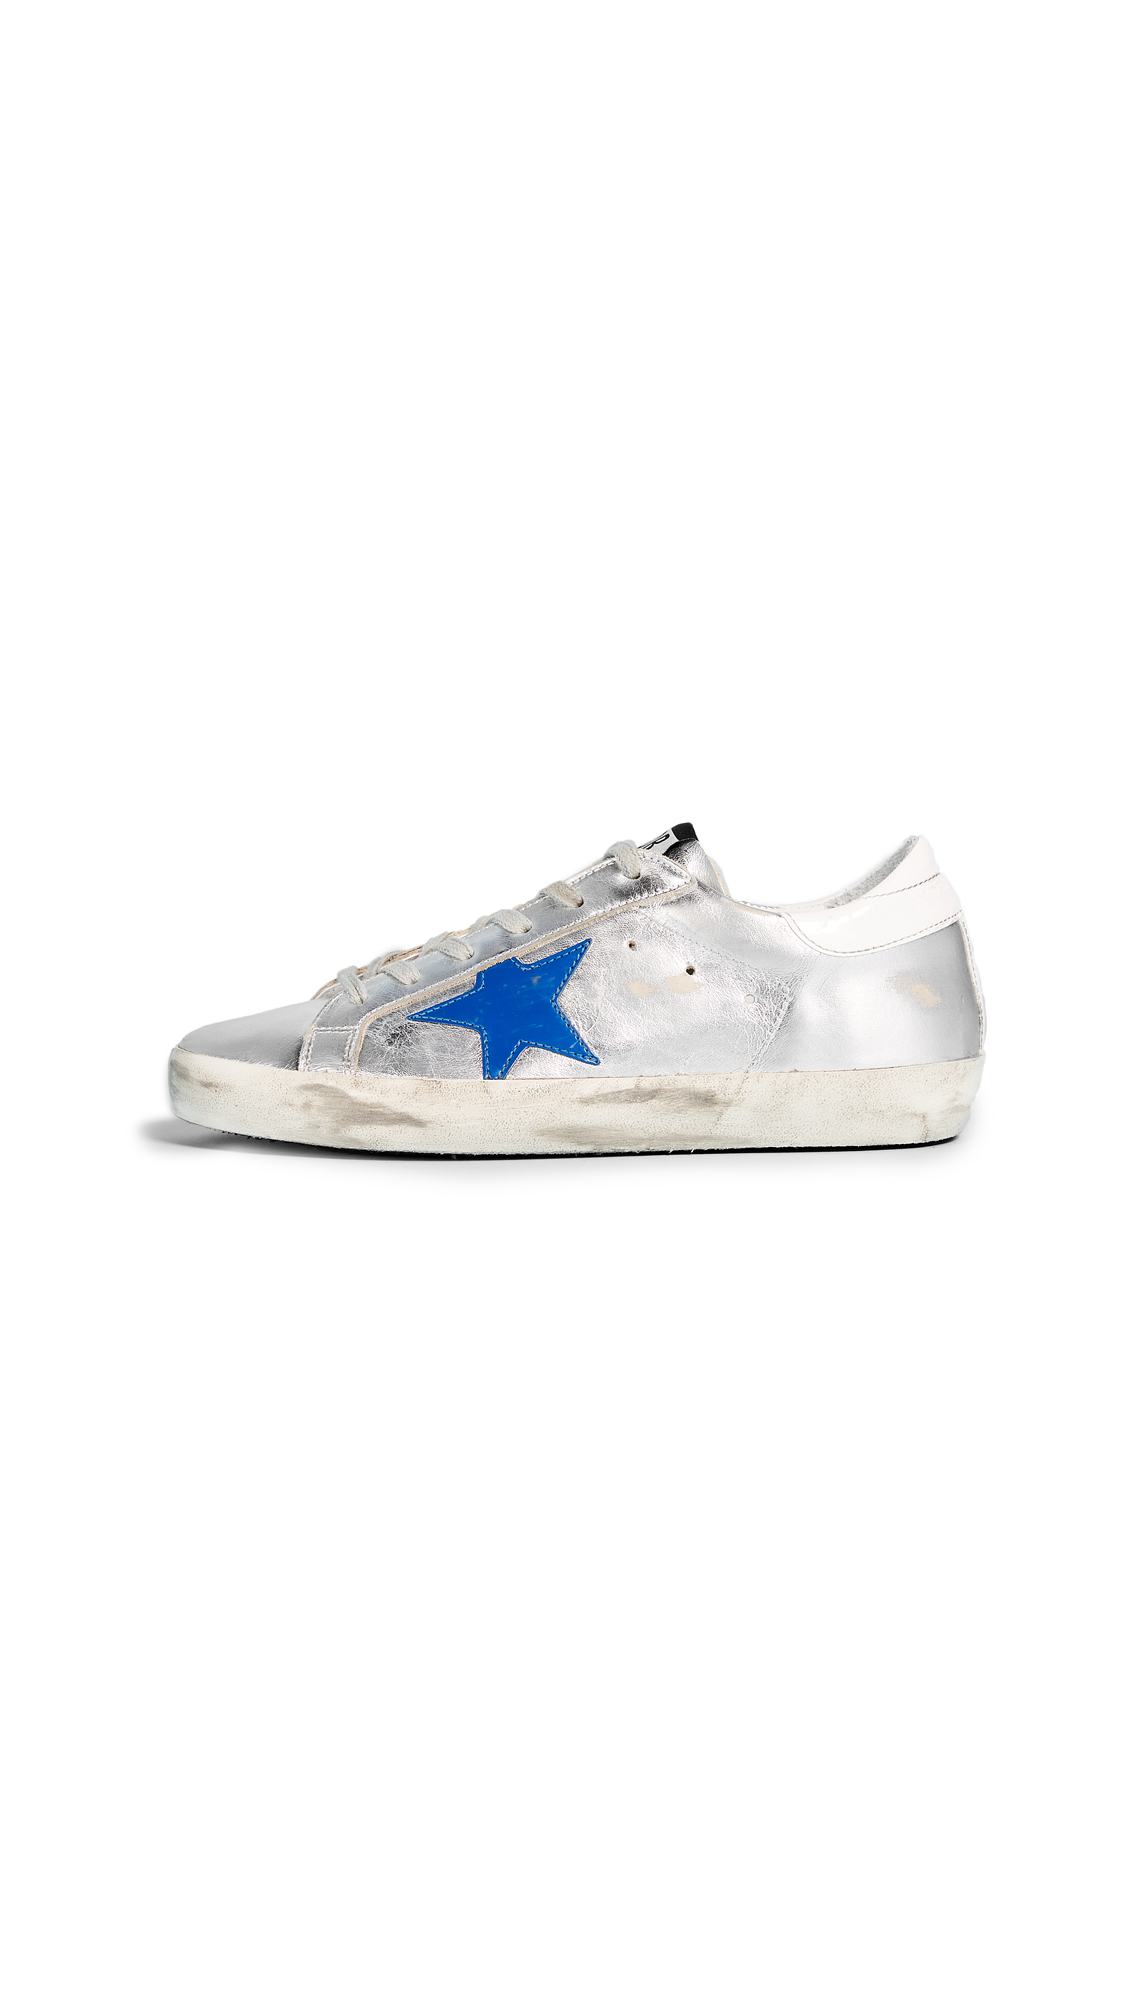 Golden Goose Superstar Sneakers - Silver/Red/Blue